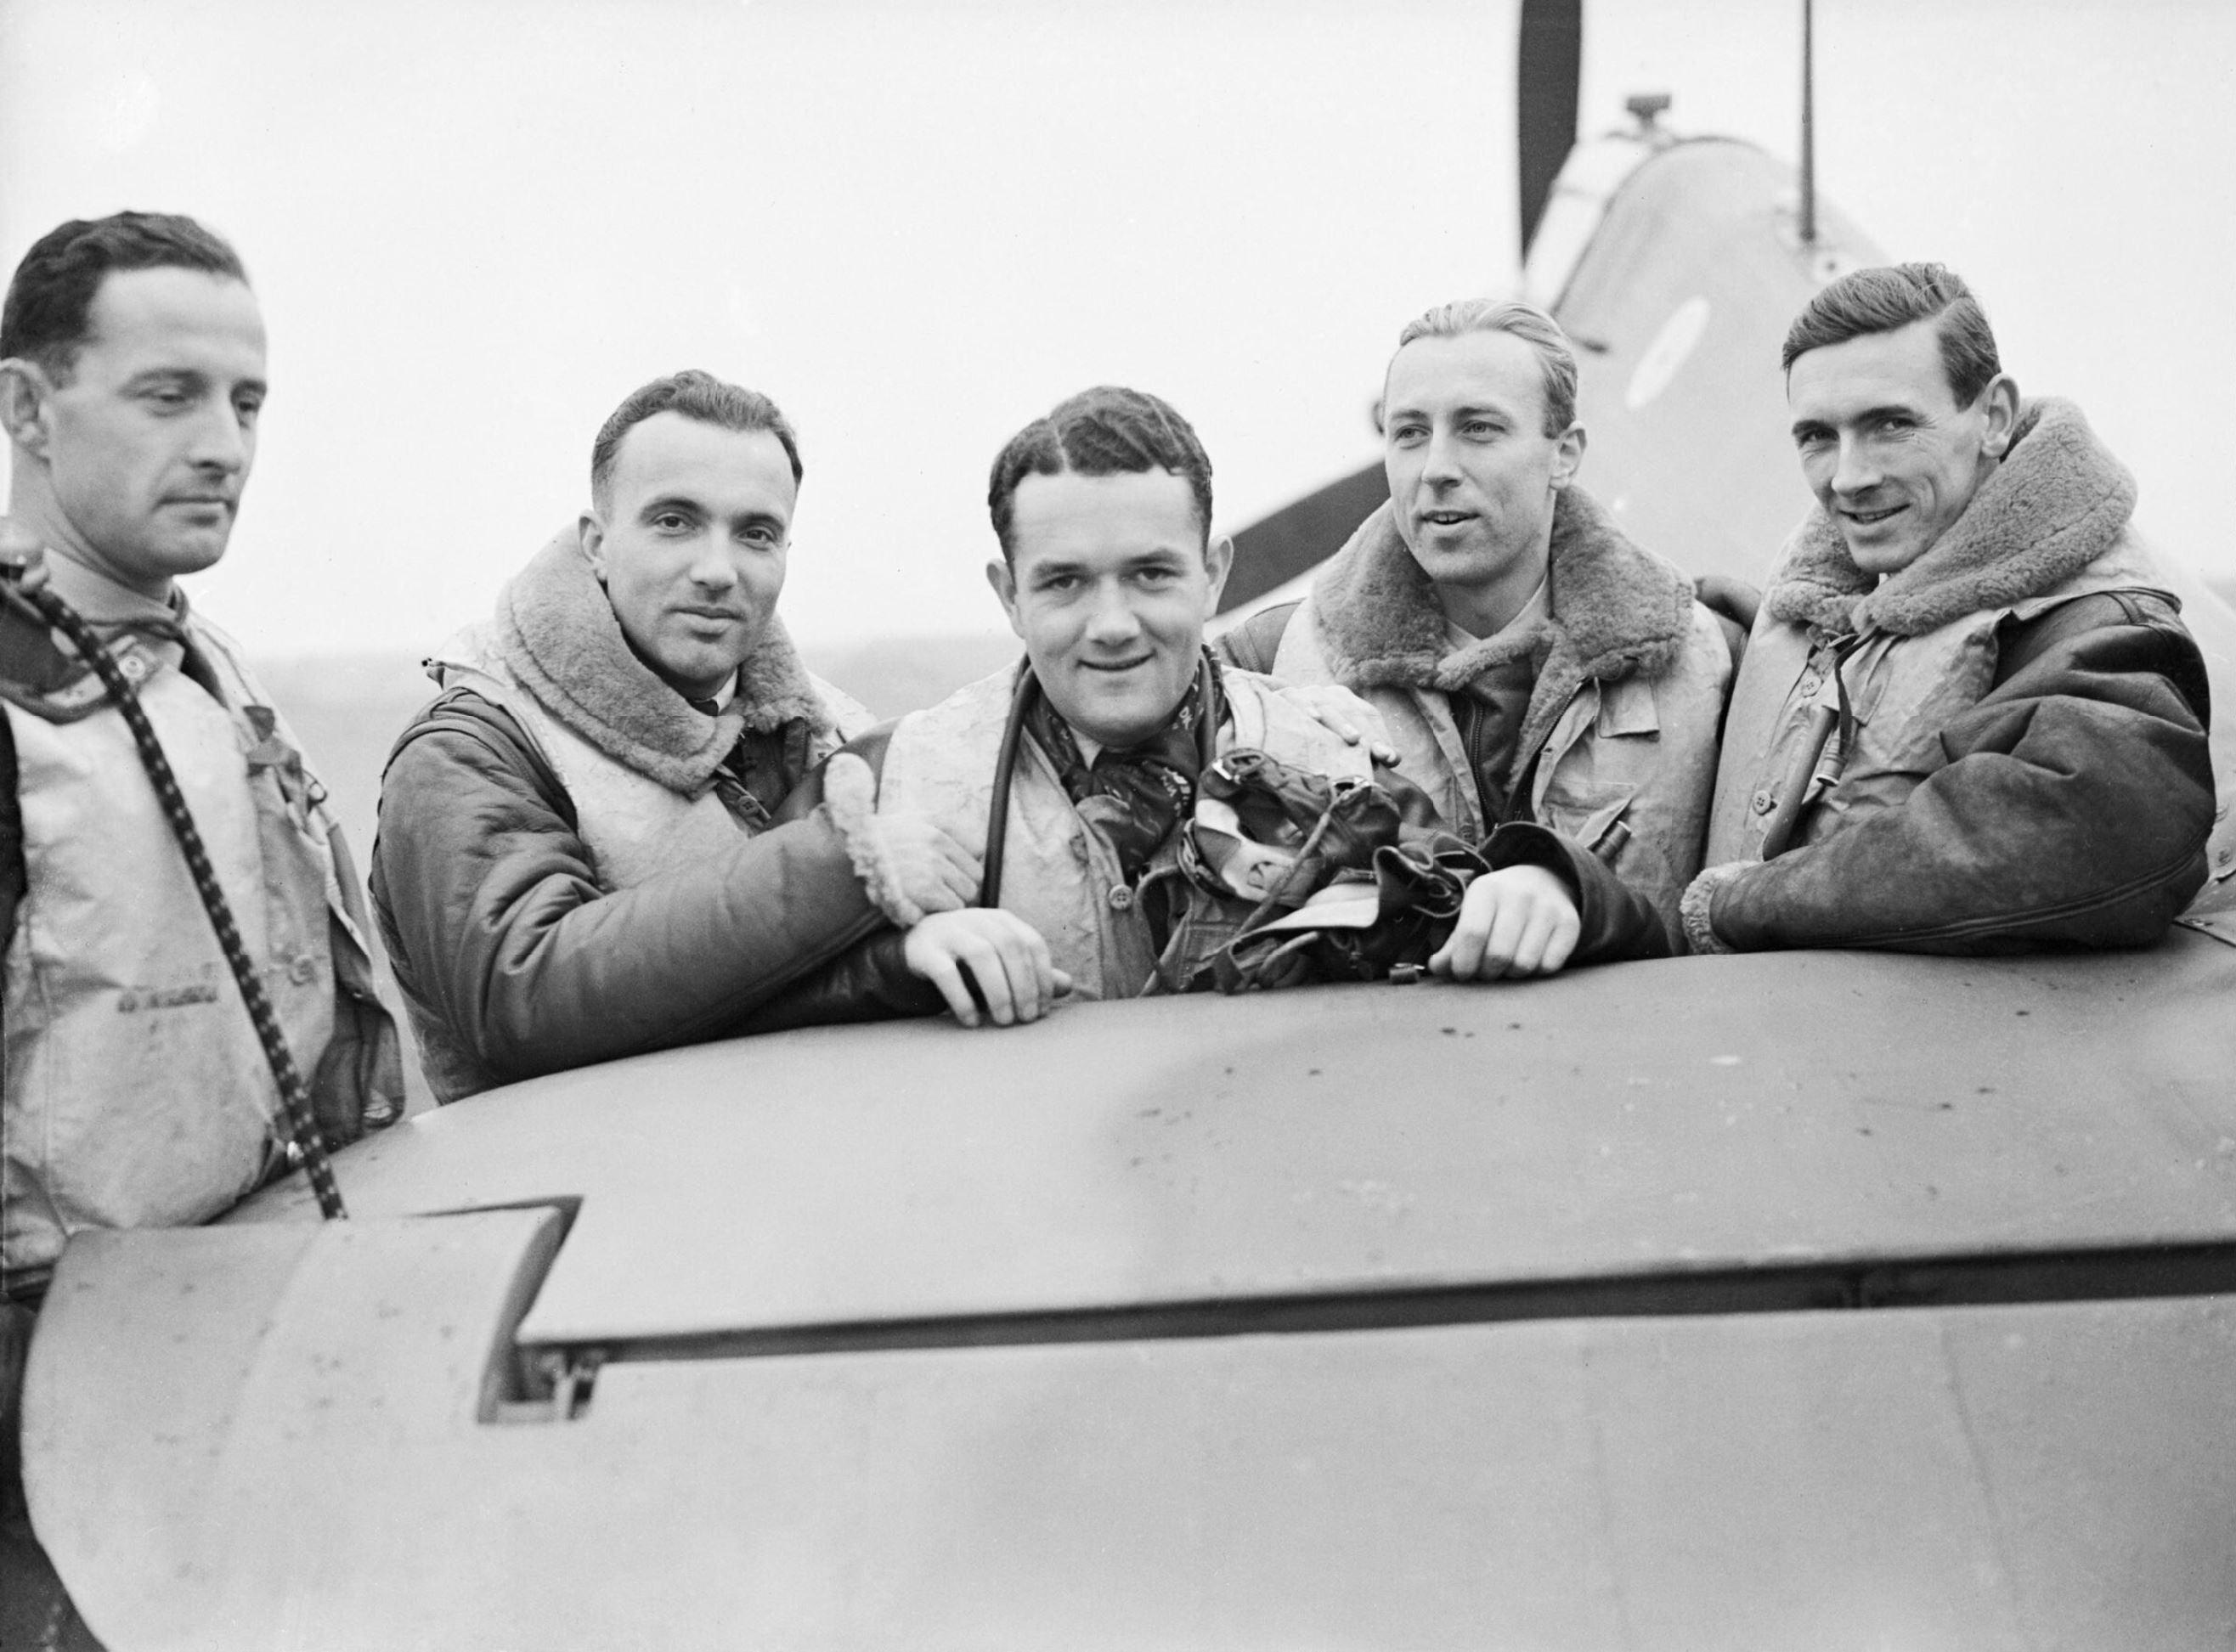 Aircrew RAF 303Sqn (Polish) pilots at RAF Leconfield Yorkshire 24th Oct 1940 IWM CH1533